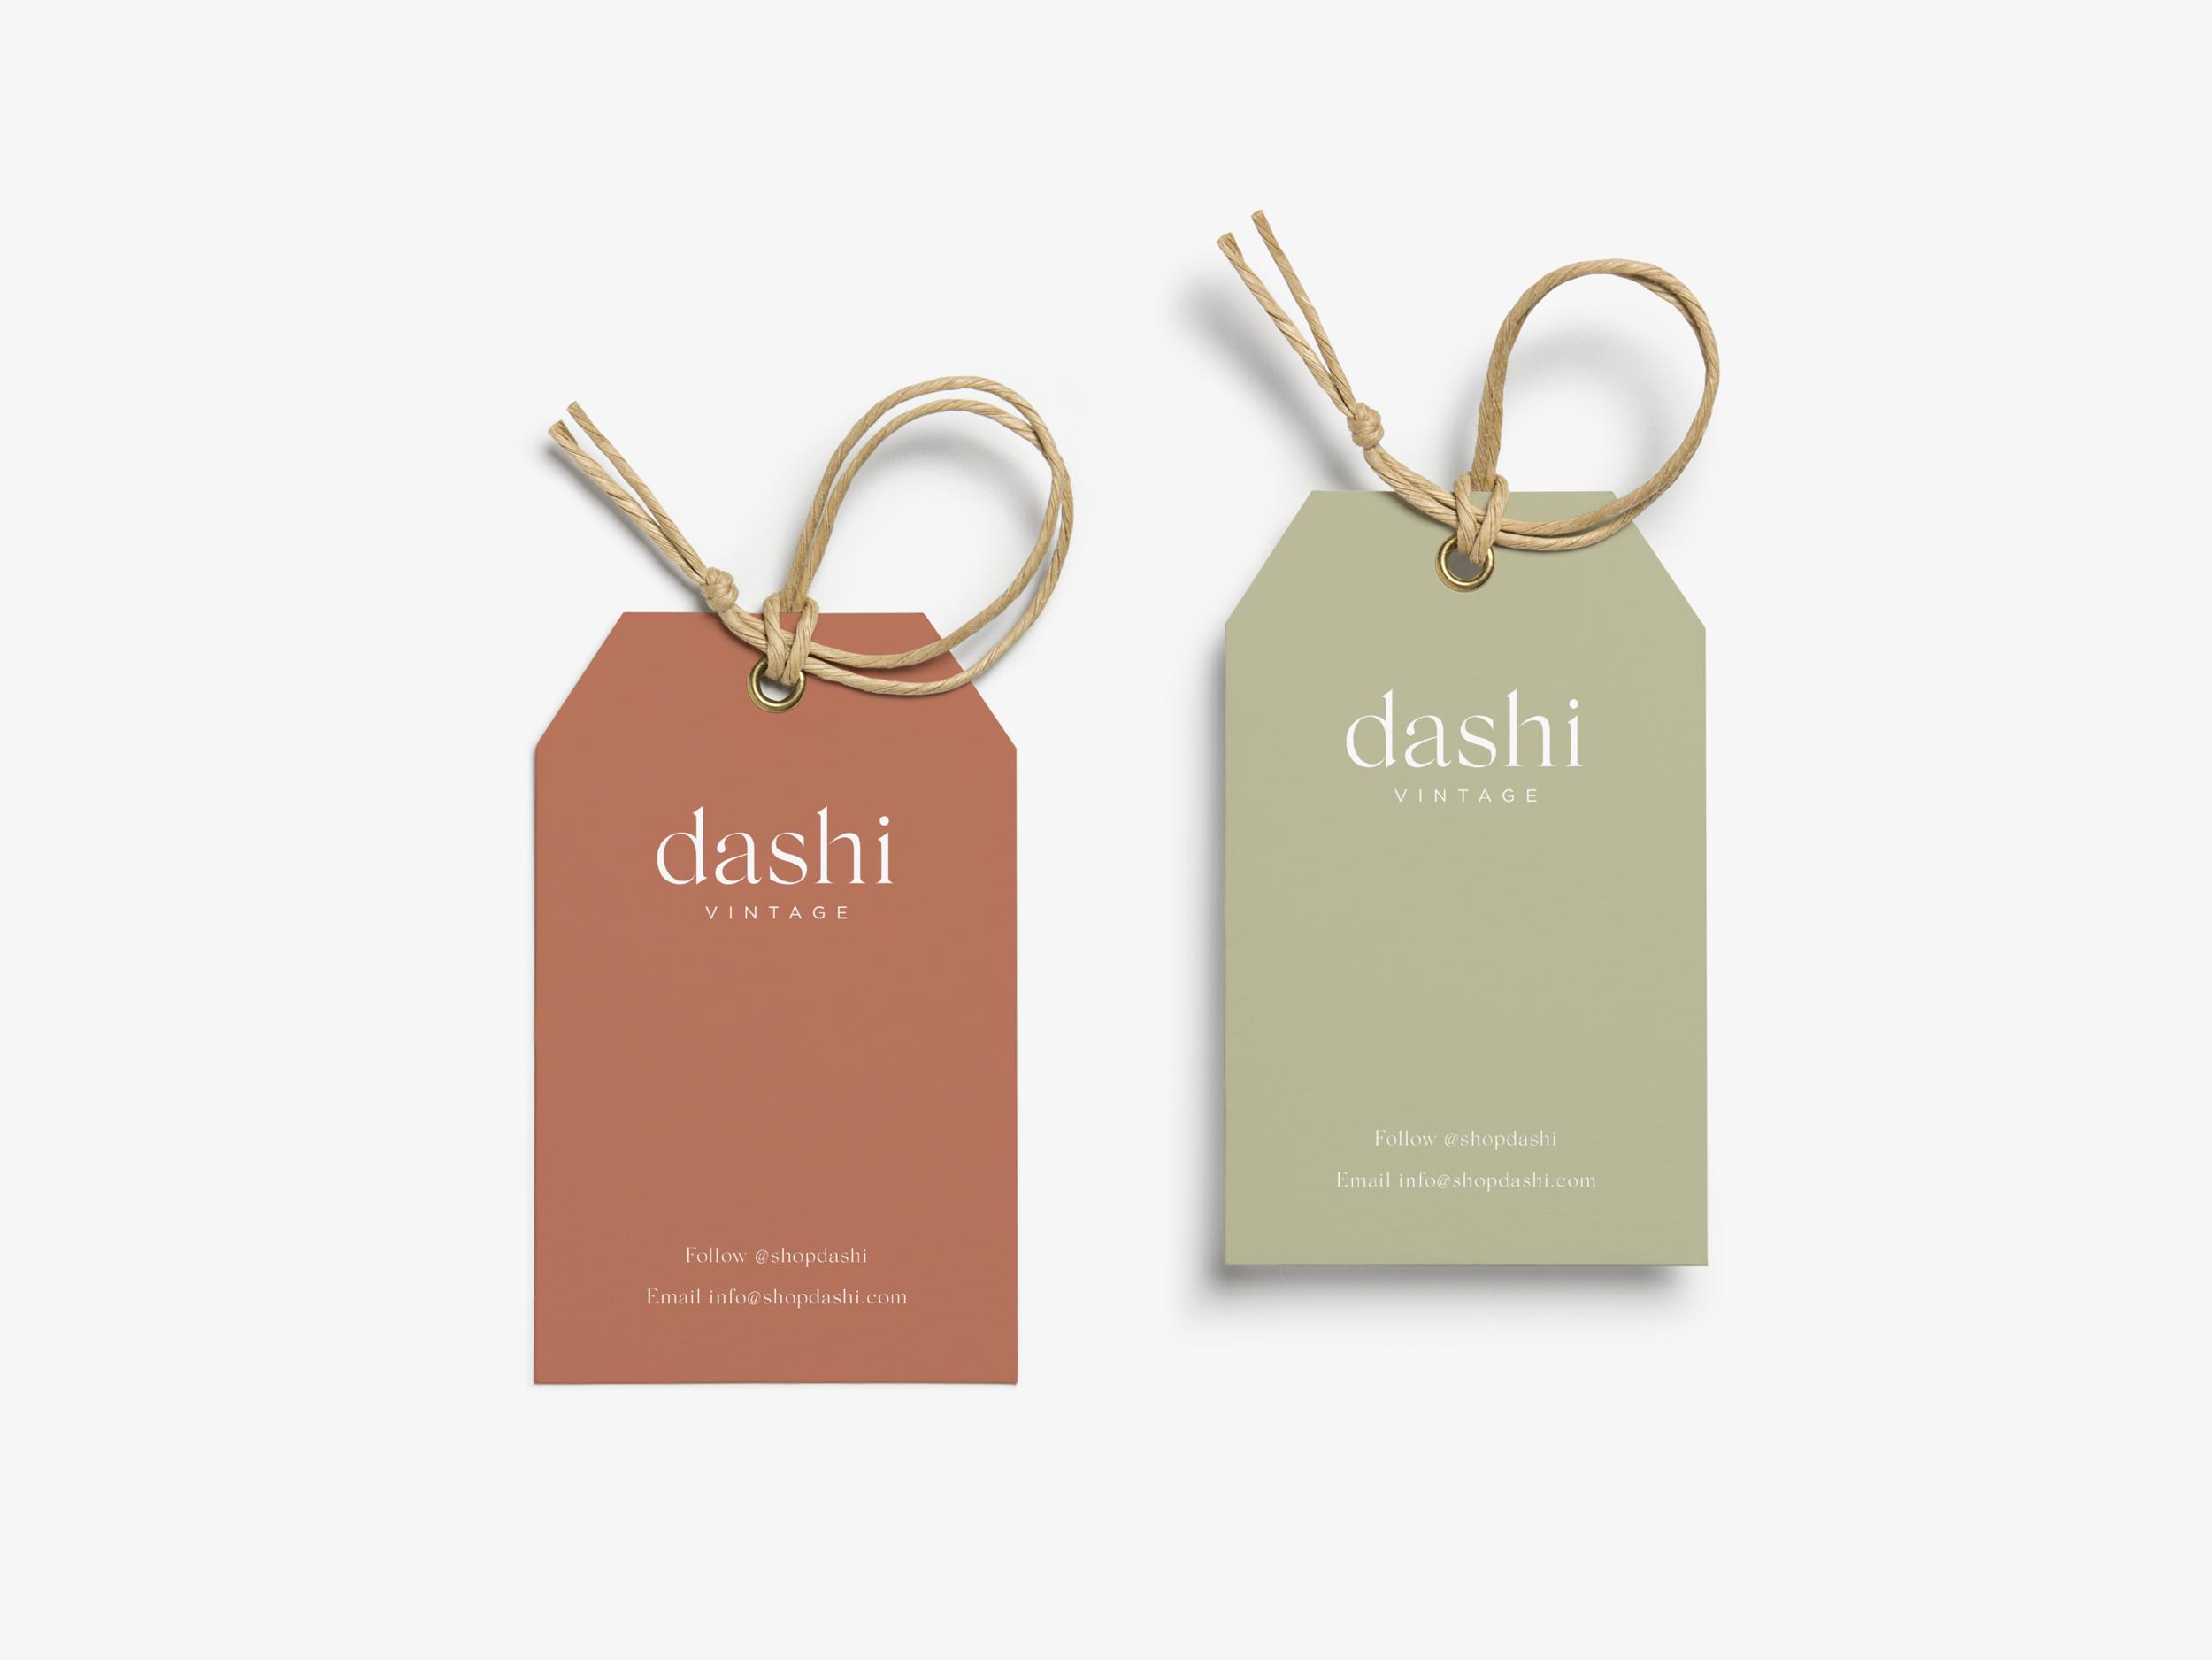 dashi-5.png